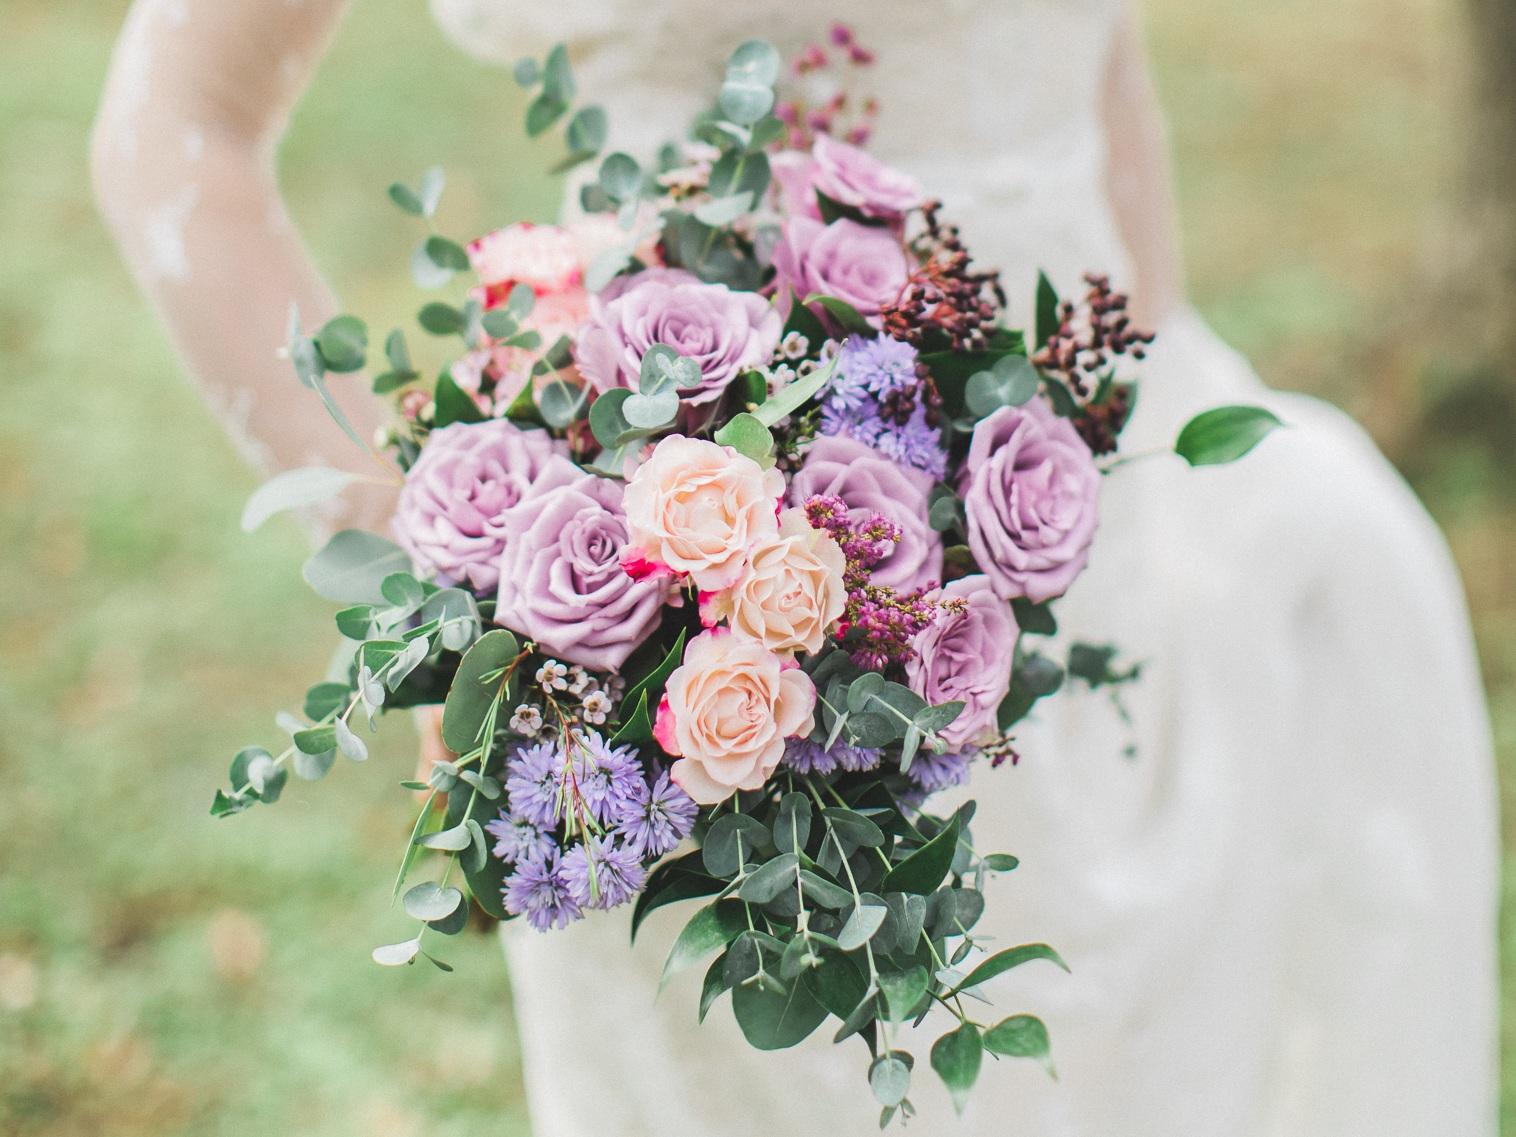 Wedding& Bridal 婚禮花藝 - 我們將幫您量身訂製您喜愛的新娘捧花、新郎胸花、花冠、手腕花、伴娘捧花與婚禮會場佈置,請讓我們用美麗的花朵為您打造夢想中的完美婚禮。